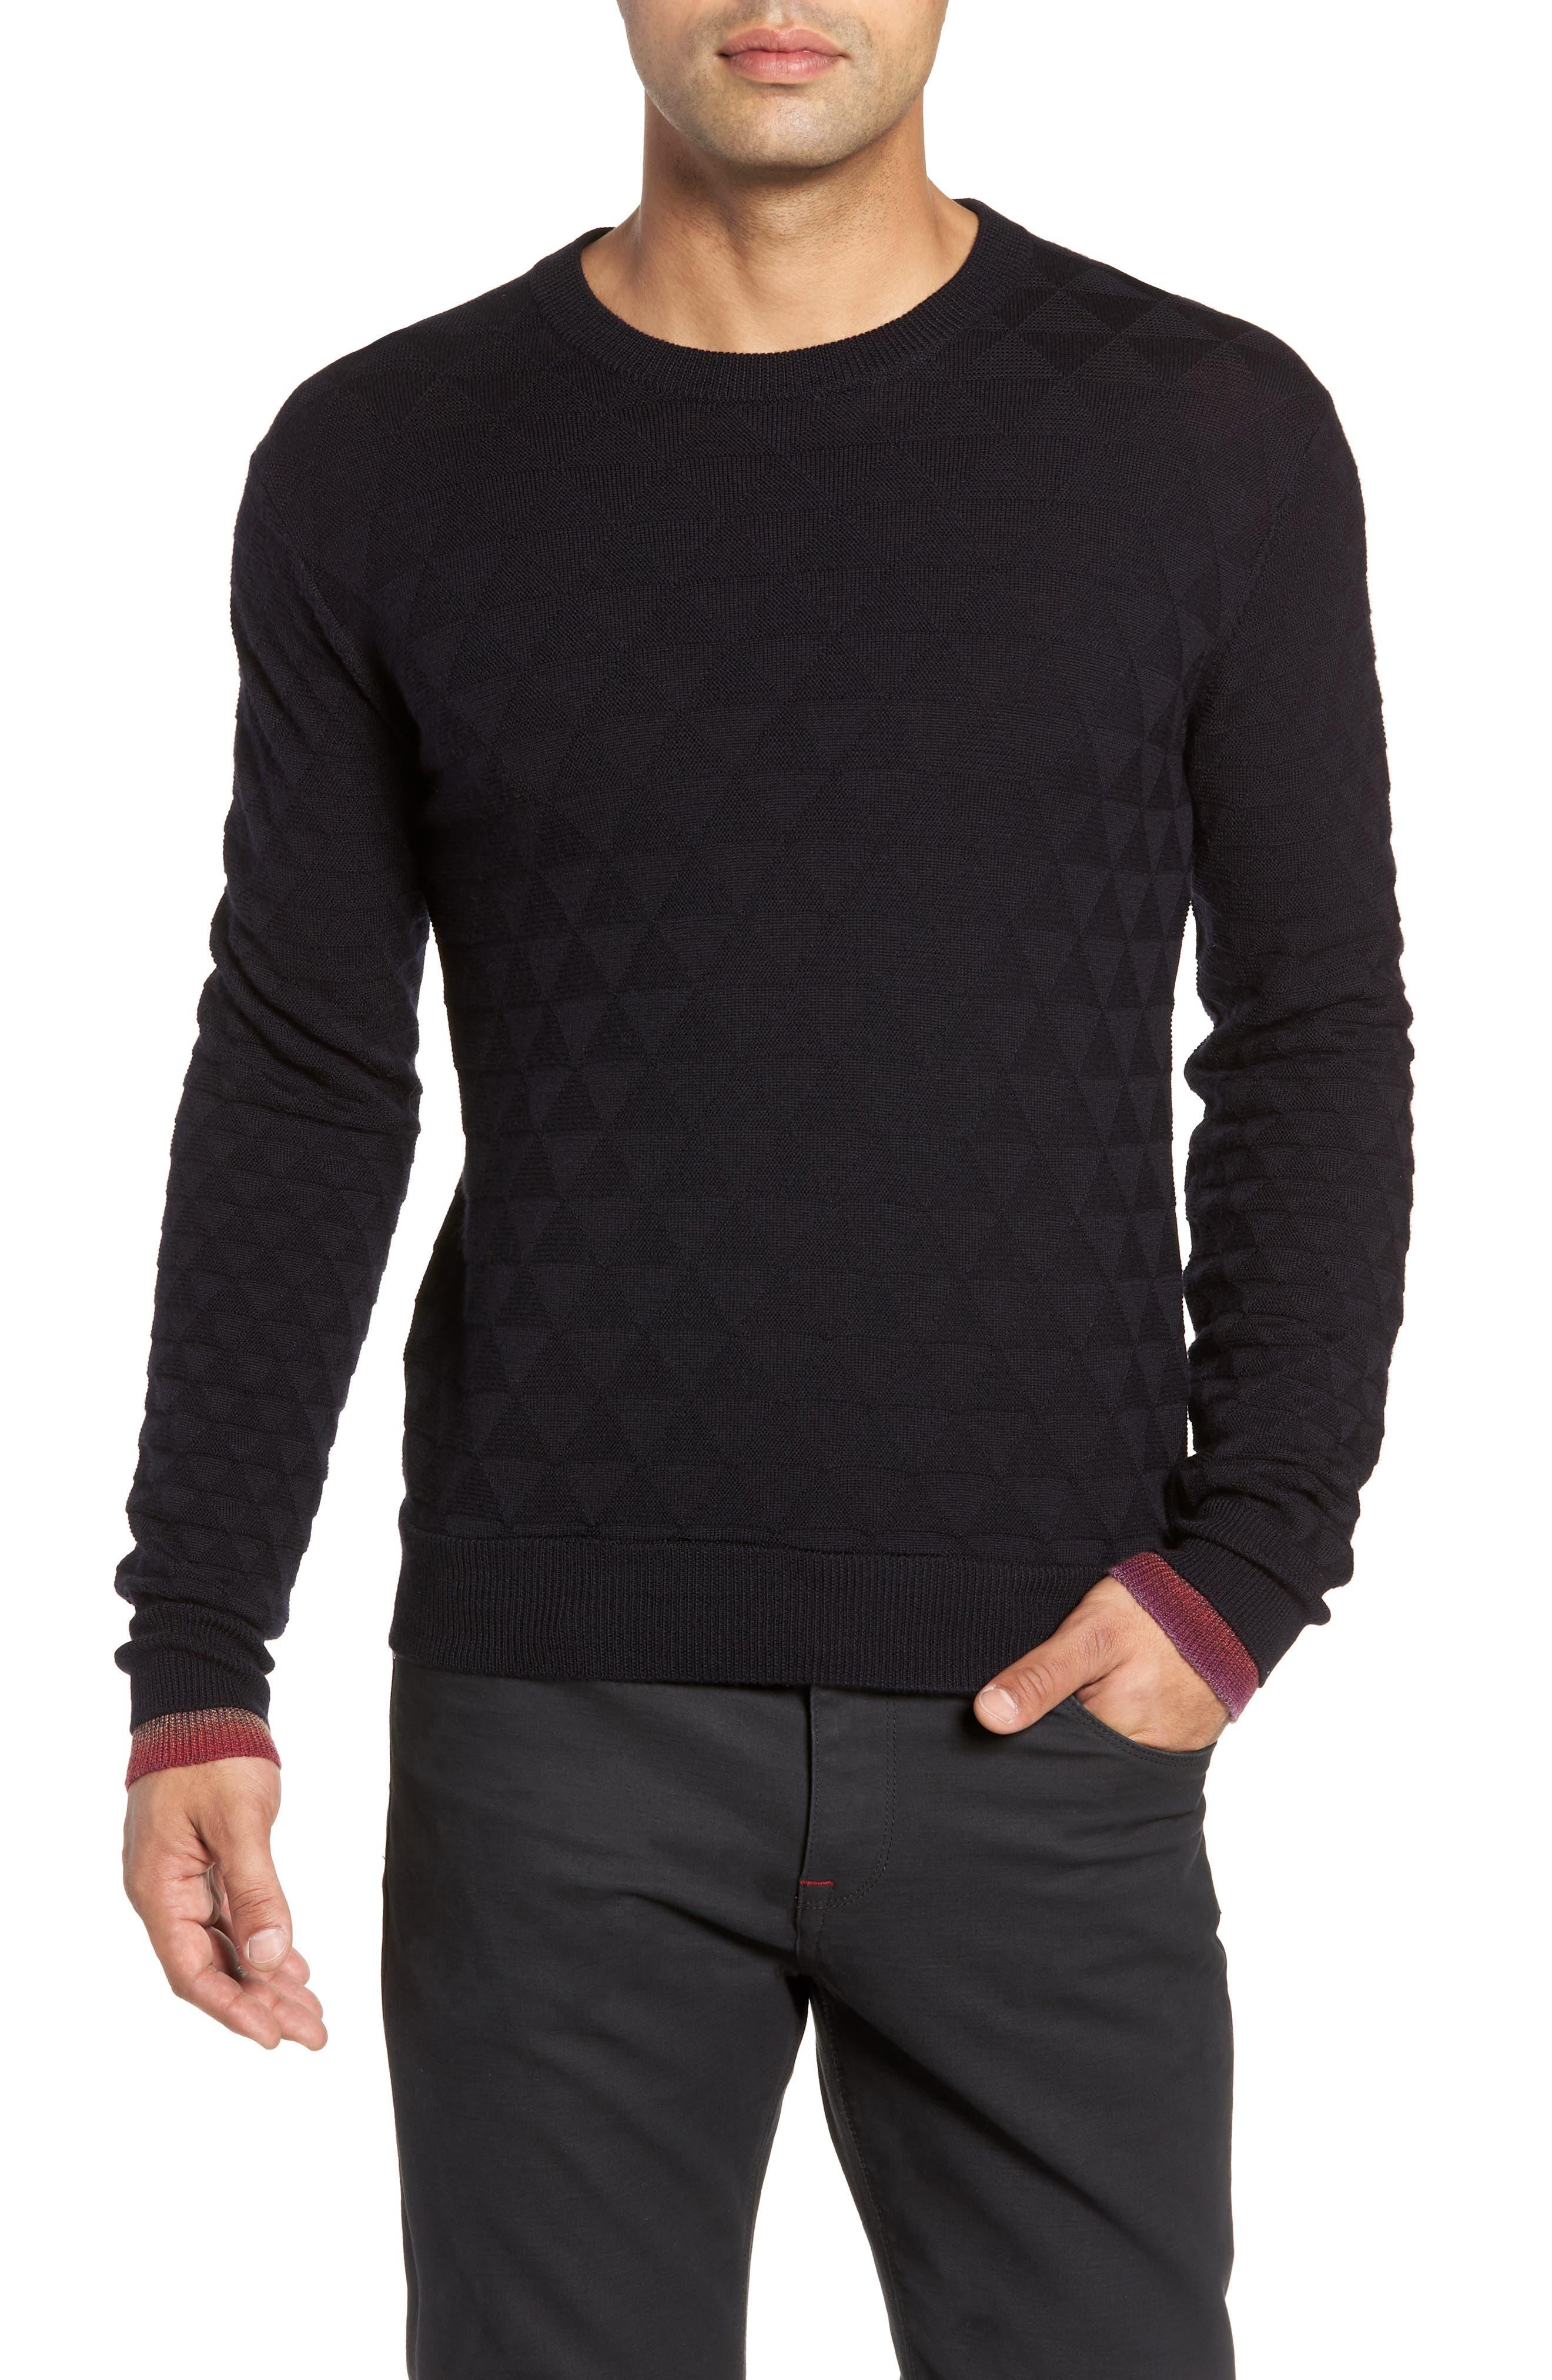 Blackburn Classic Fit Sweater,                         Main,                         color, BLACK